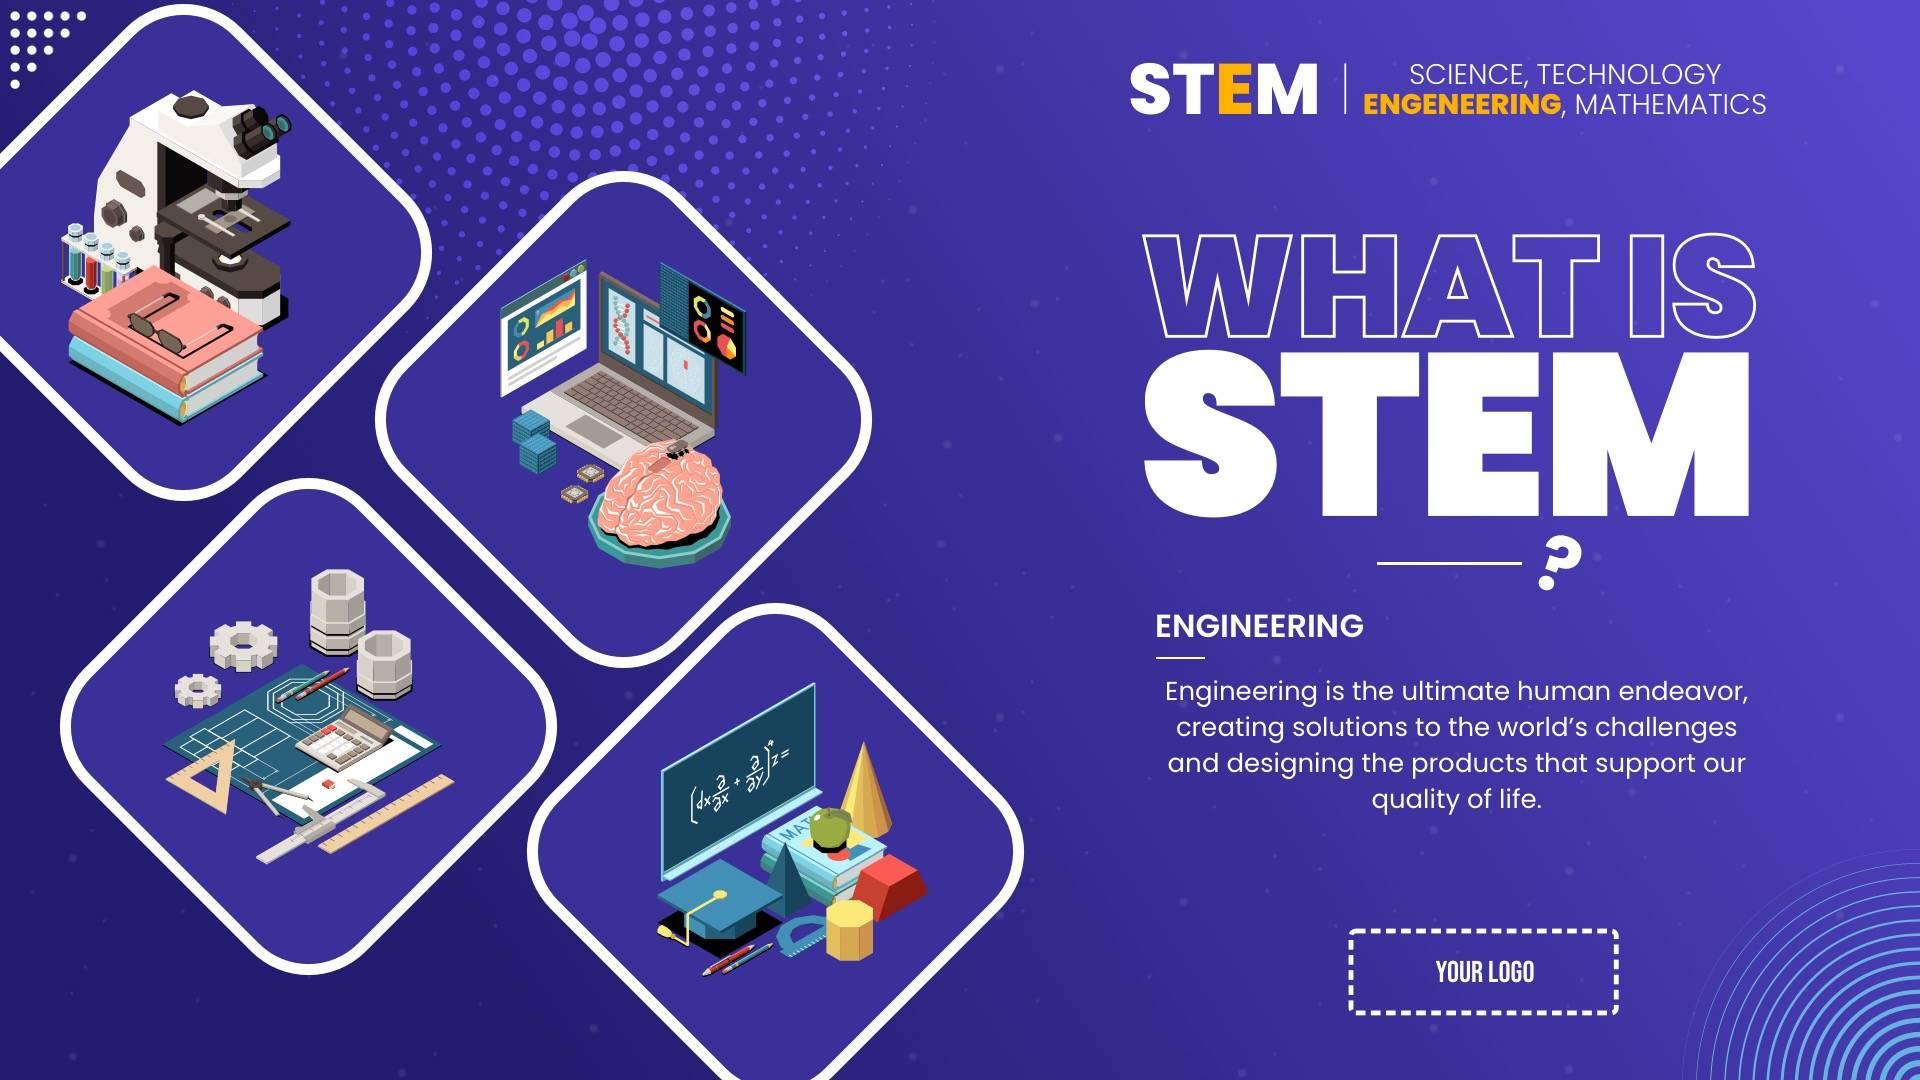 Solar Sytem - STEM Digital Signage Template